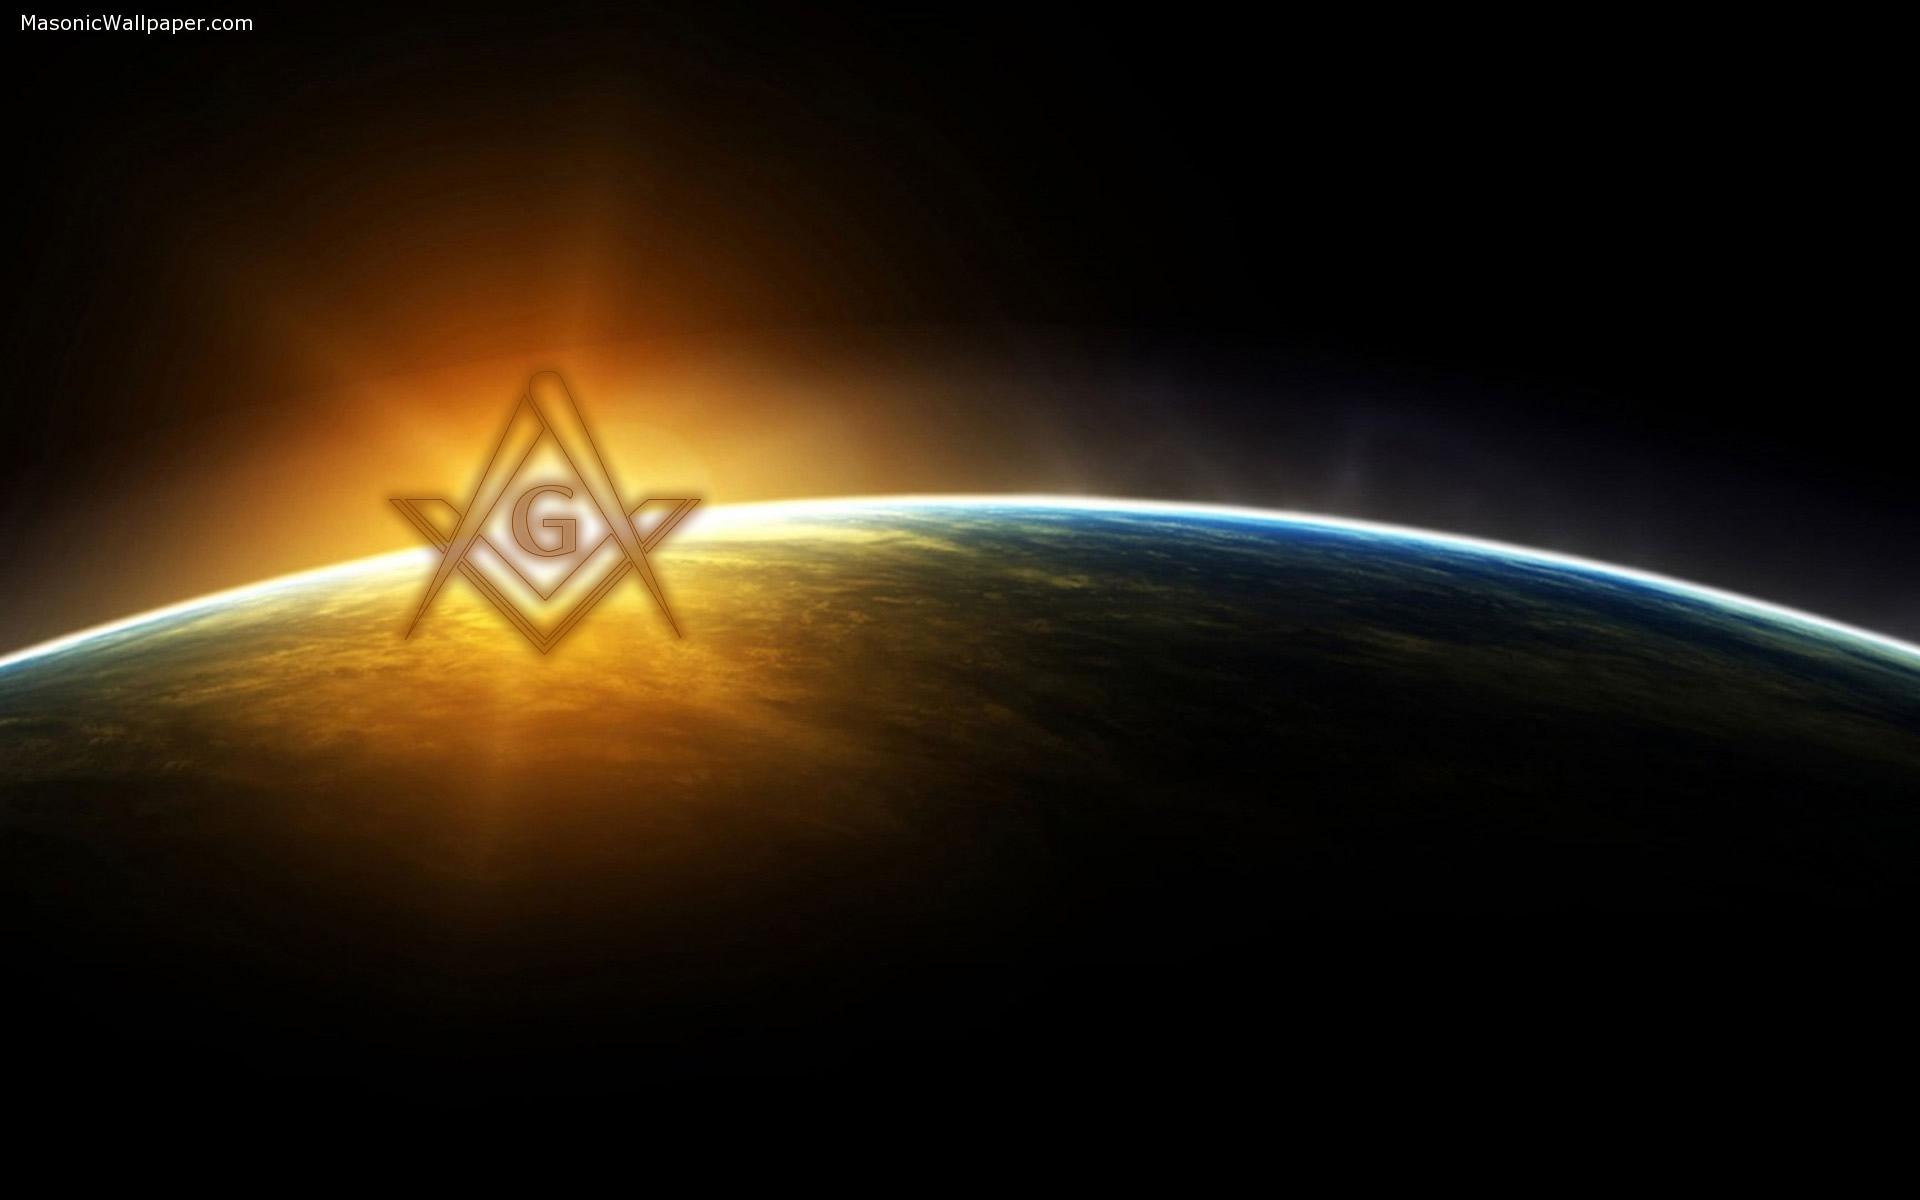 Masonic Wallpaper for your Desktop or Phone 1920x1200